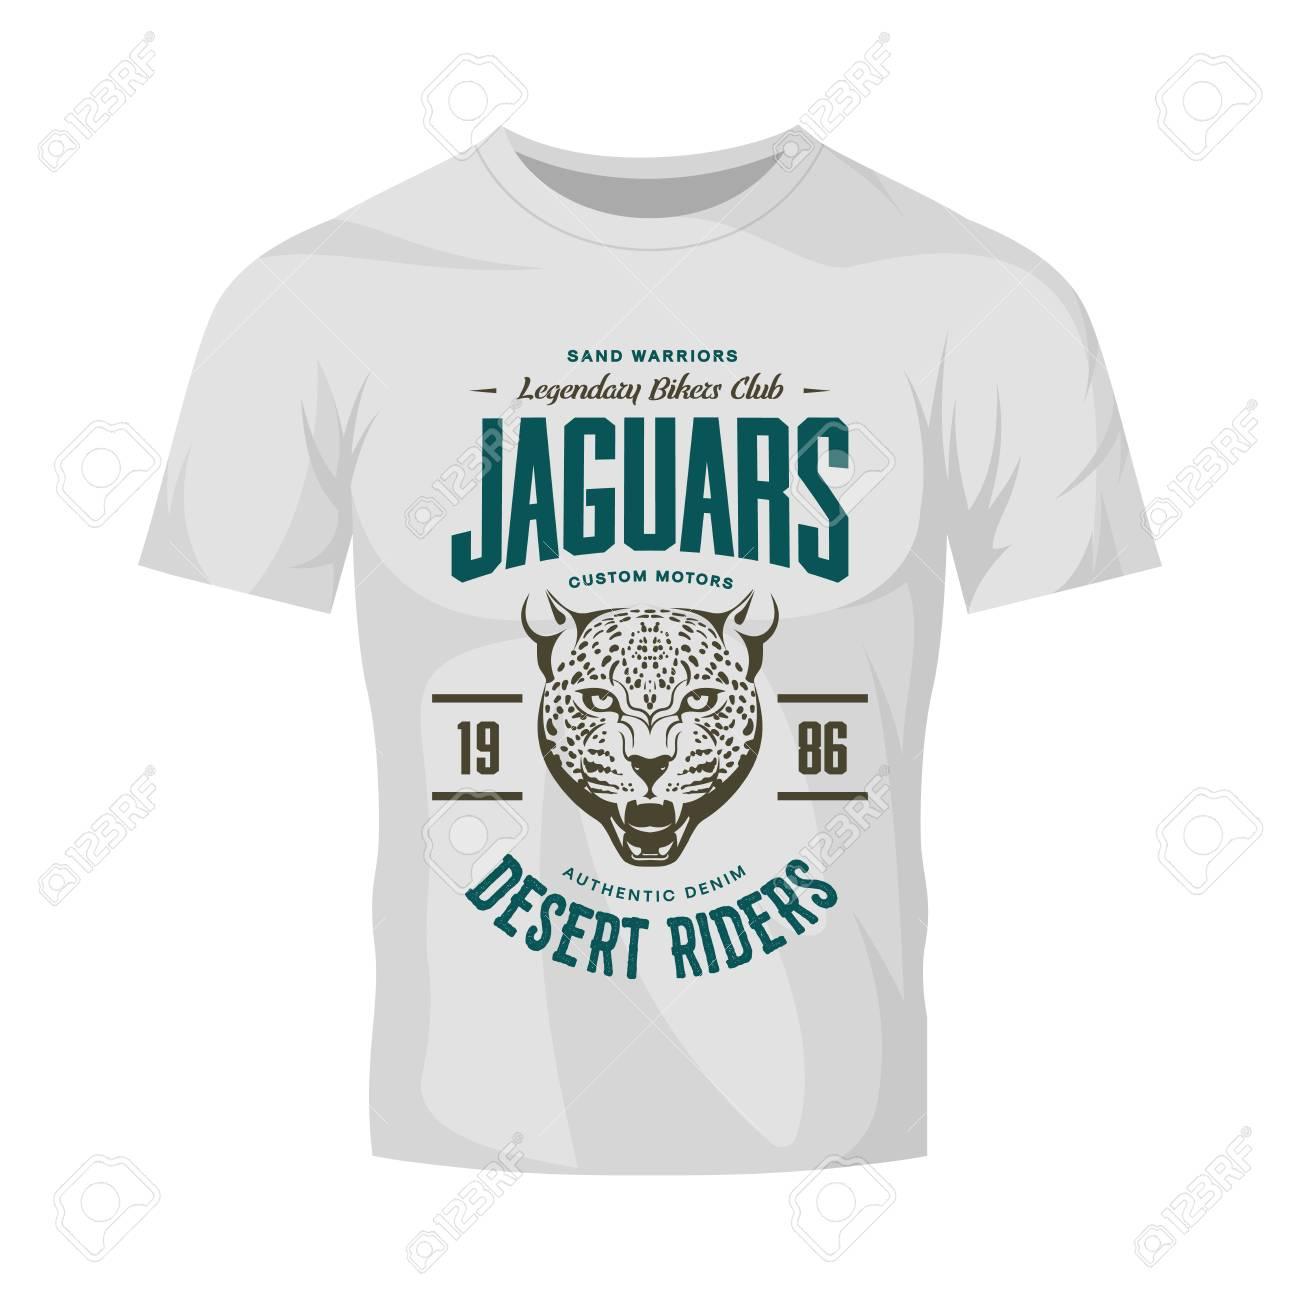 new arrival quality and quantity assured 2019 authentic Vintage furious jaguar custom moto club logo on white t-shirt..